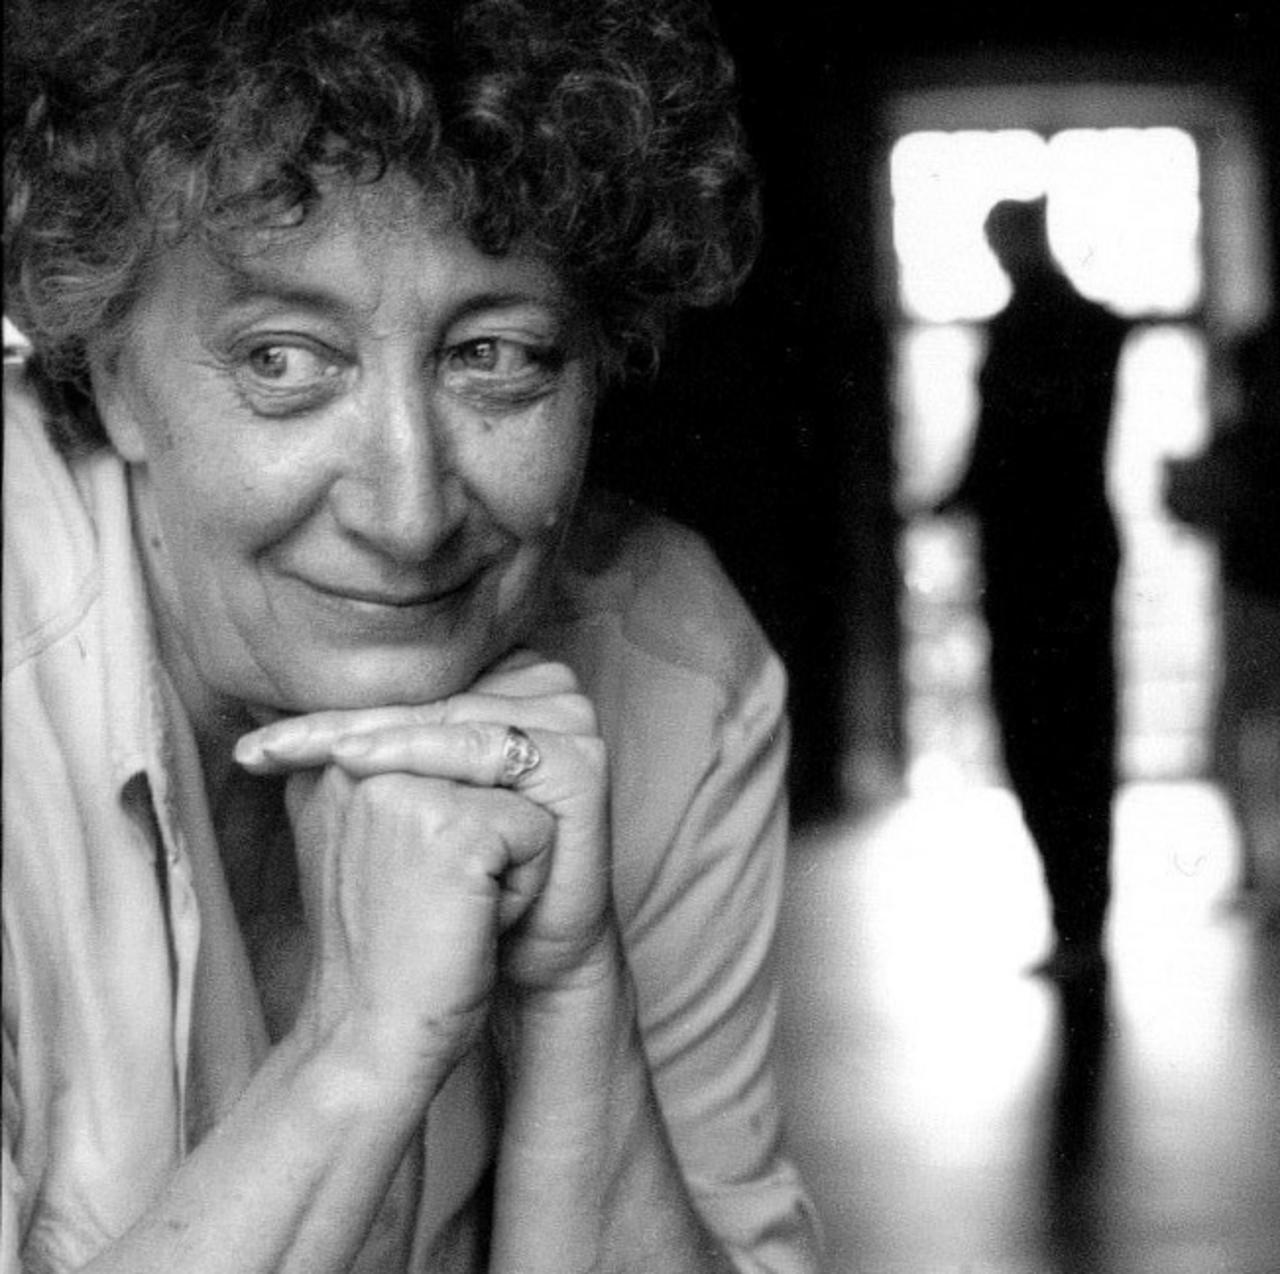 image for Buirge, Susan (née en 1940)